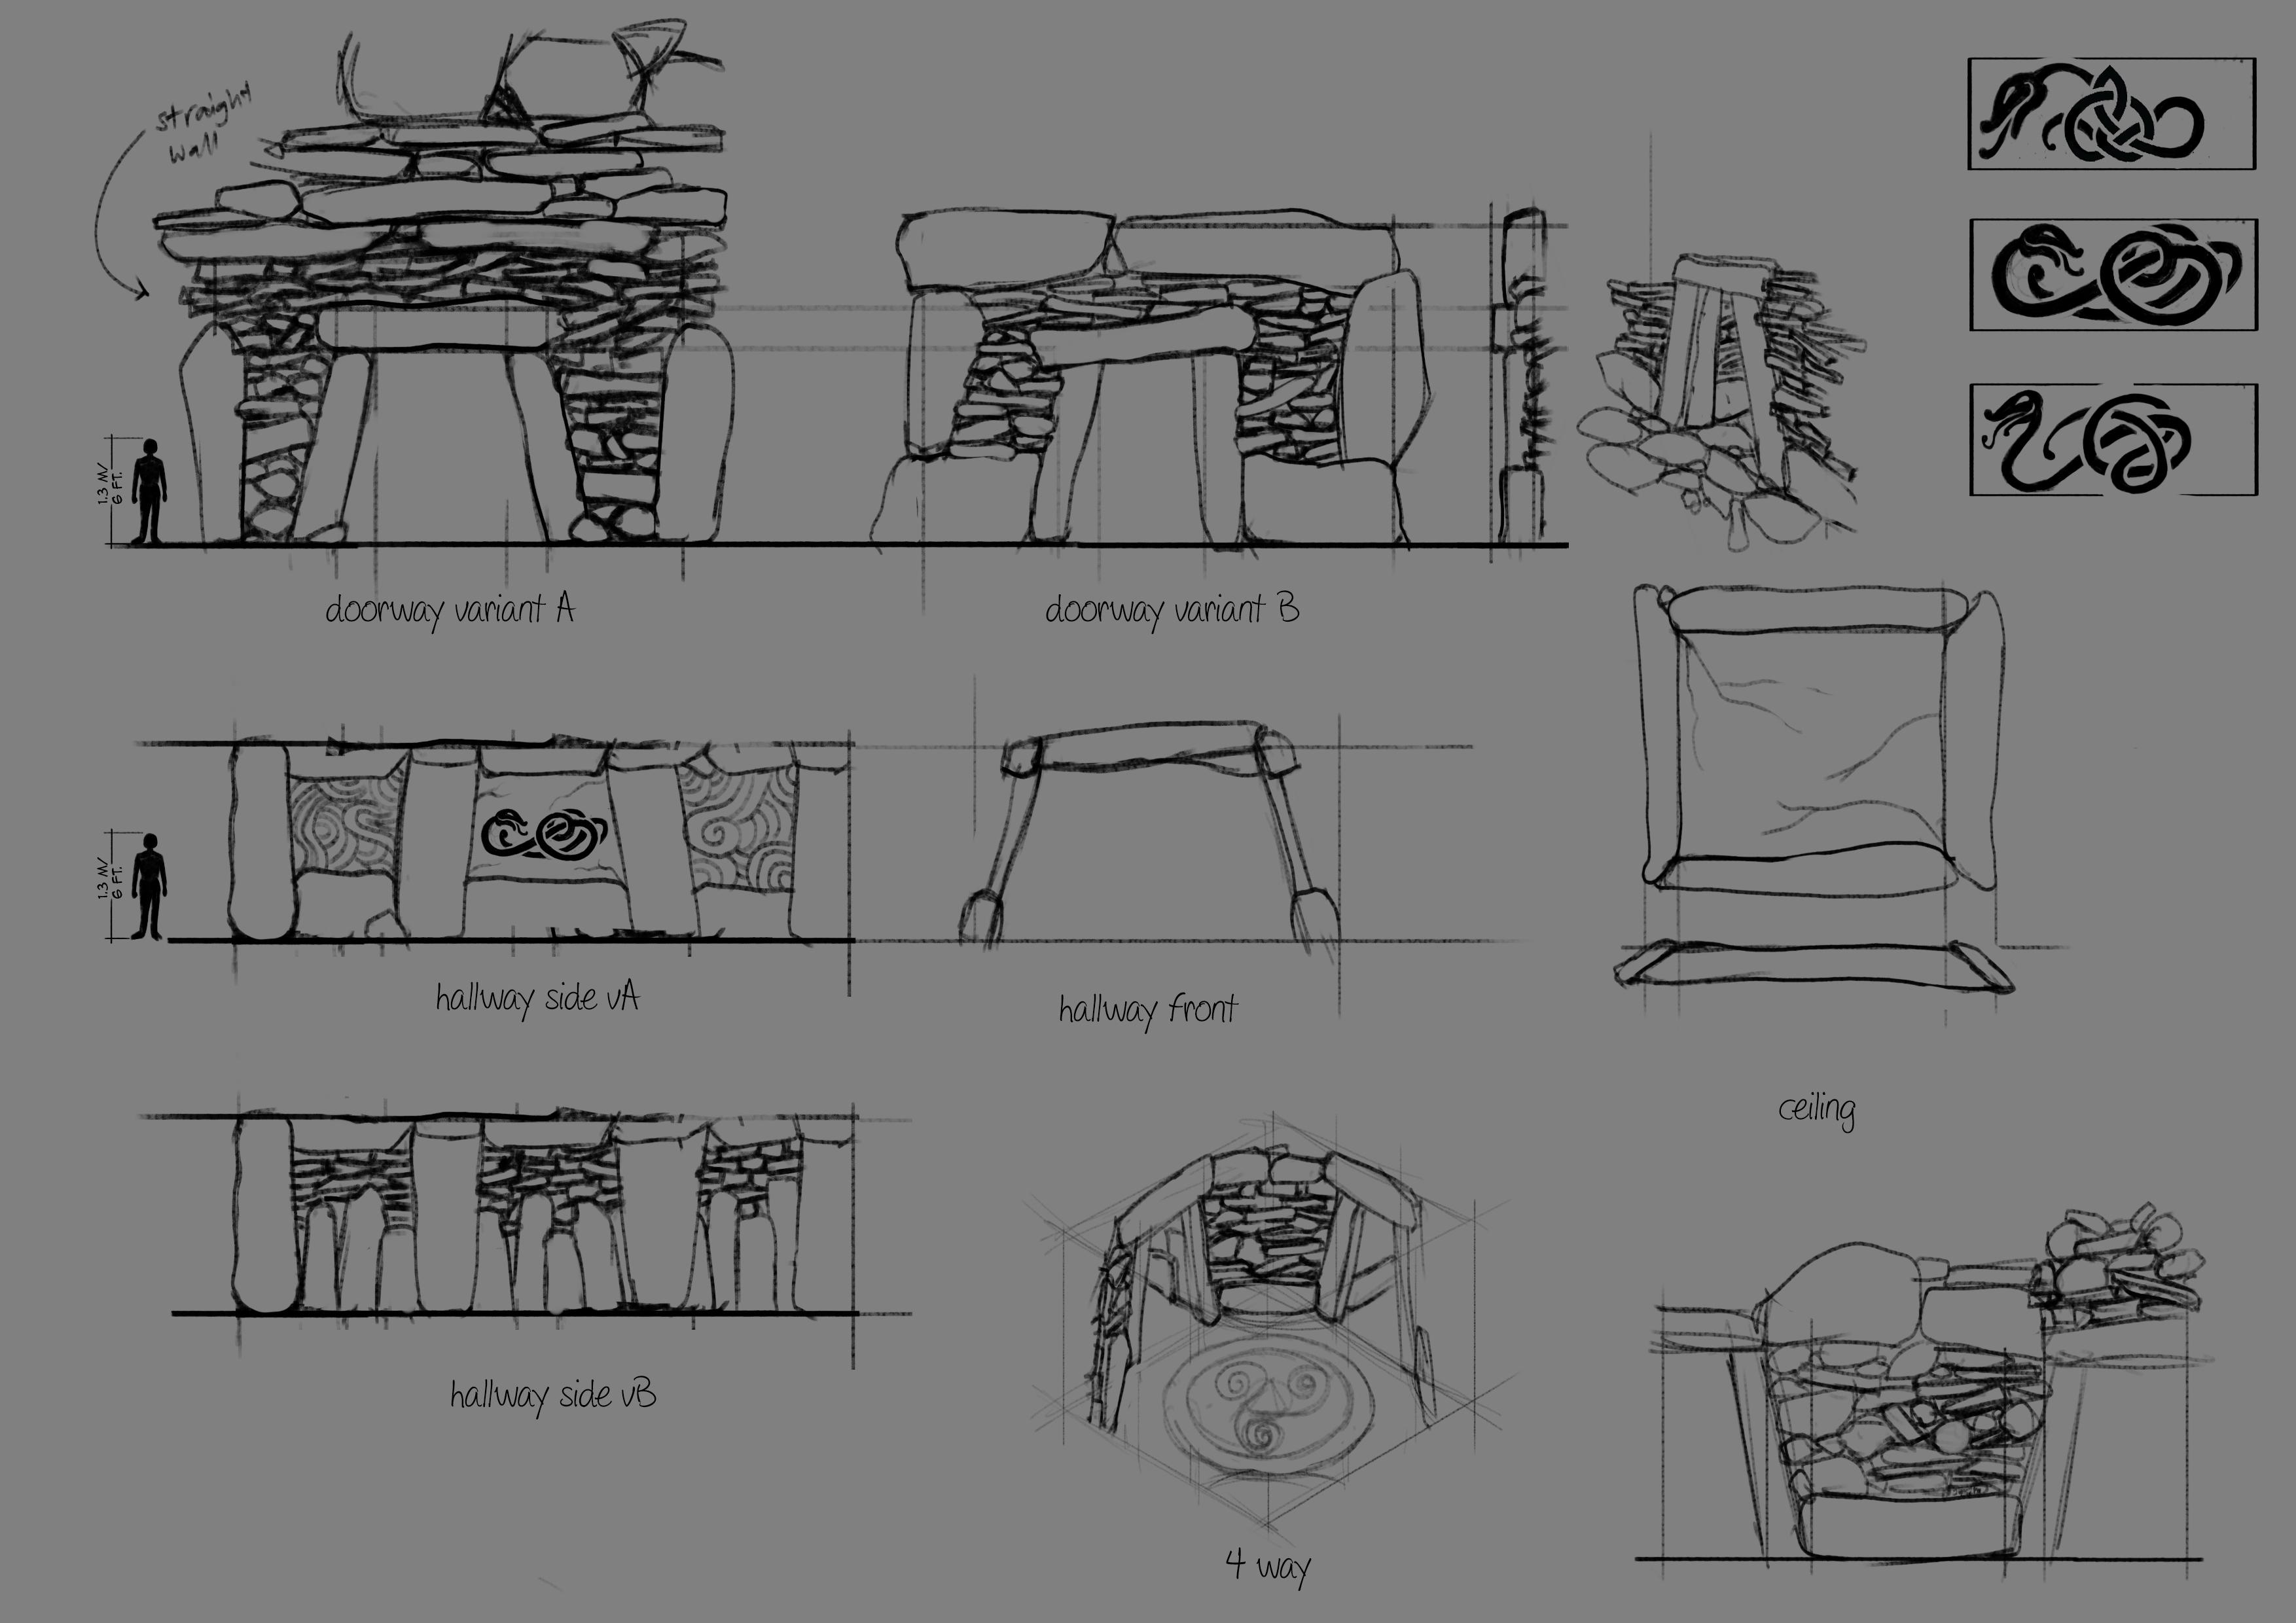 nordic tileset concept art 1